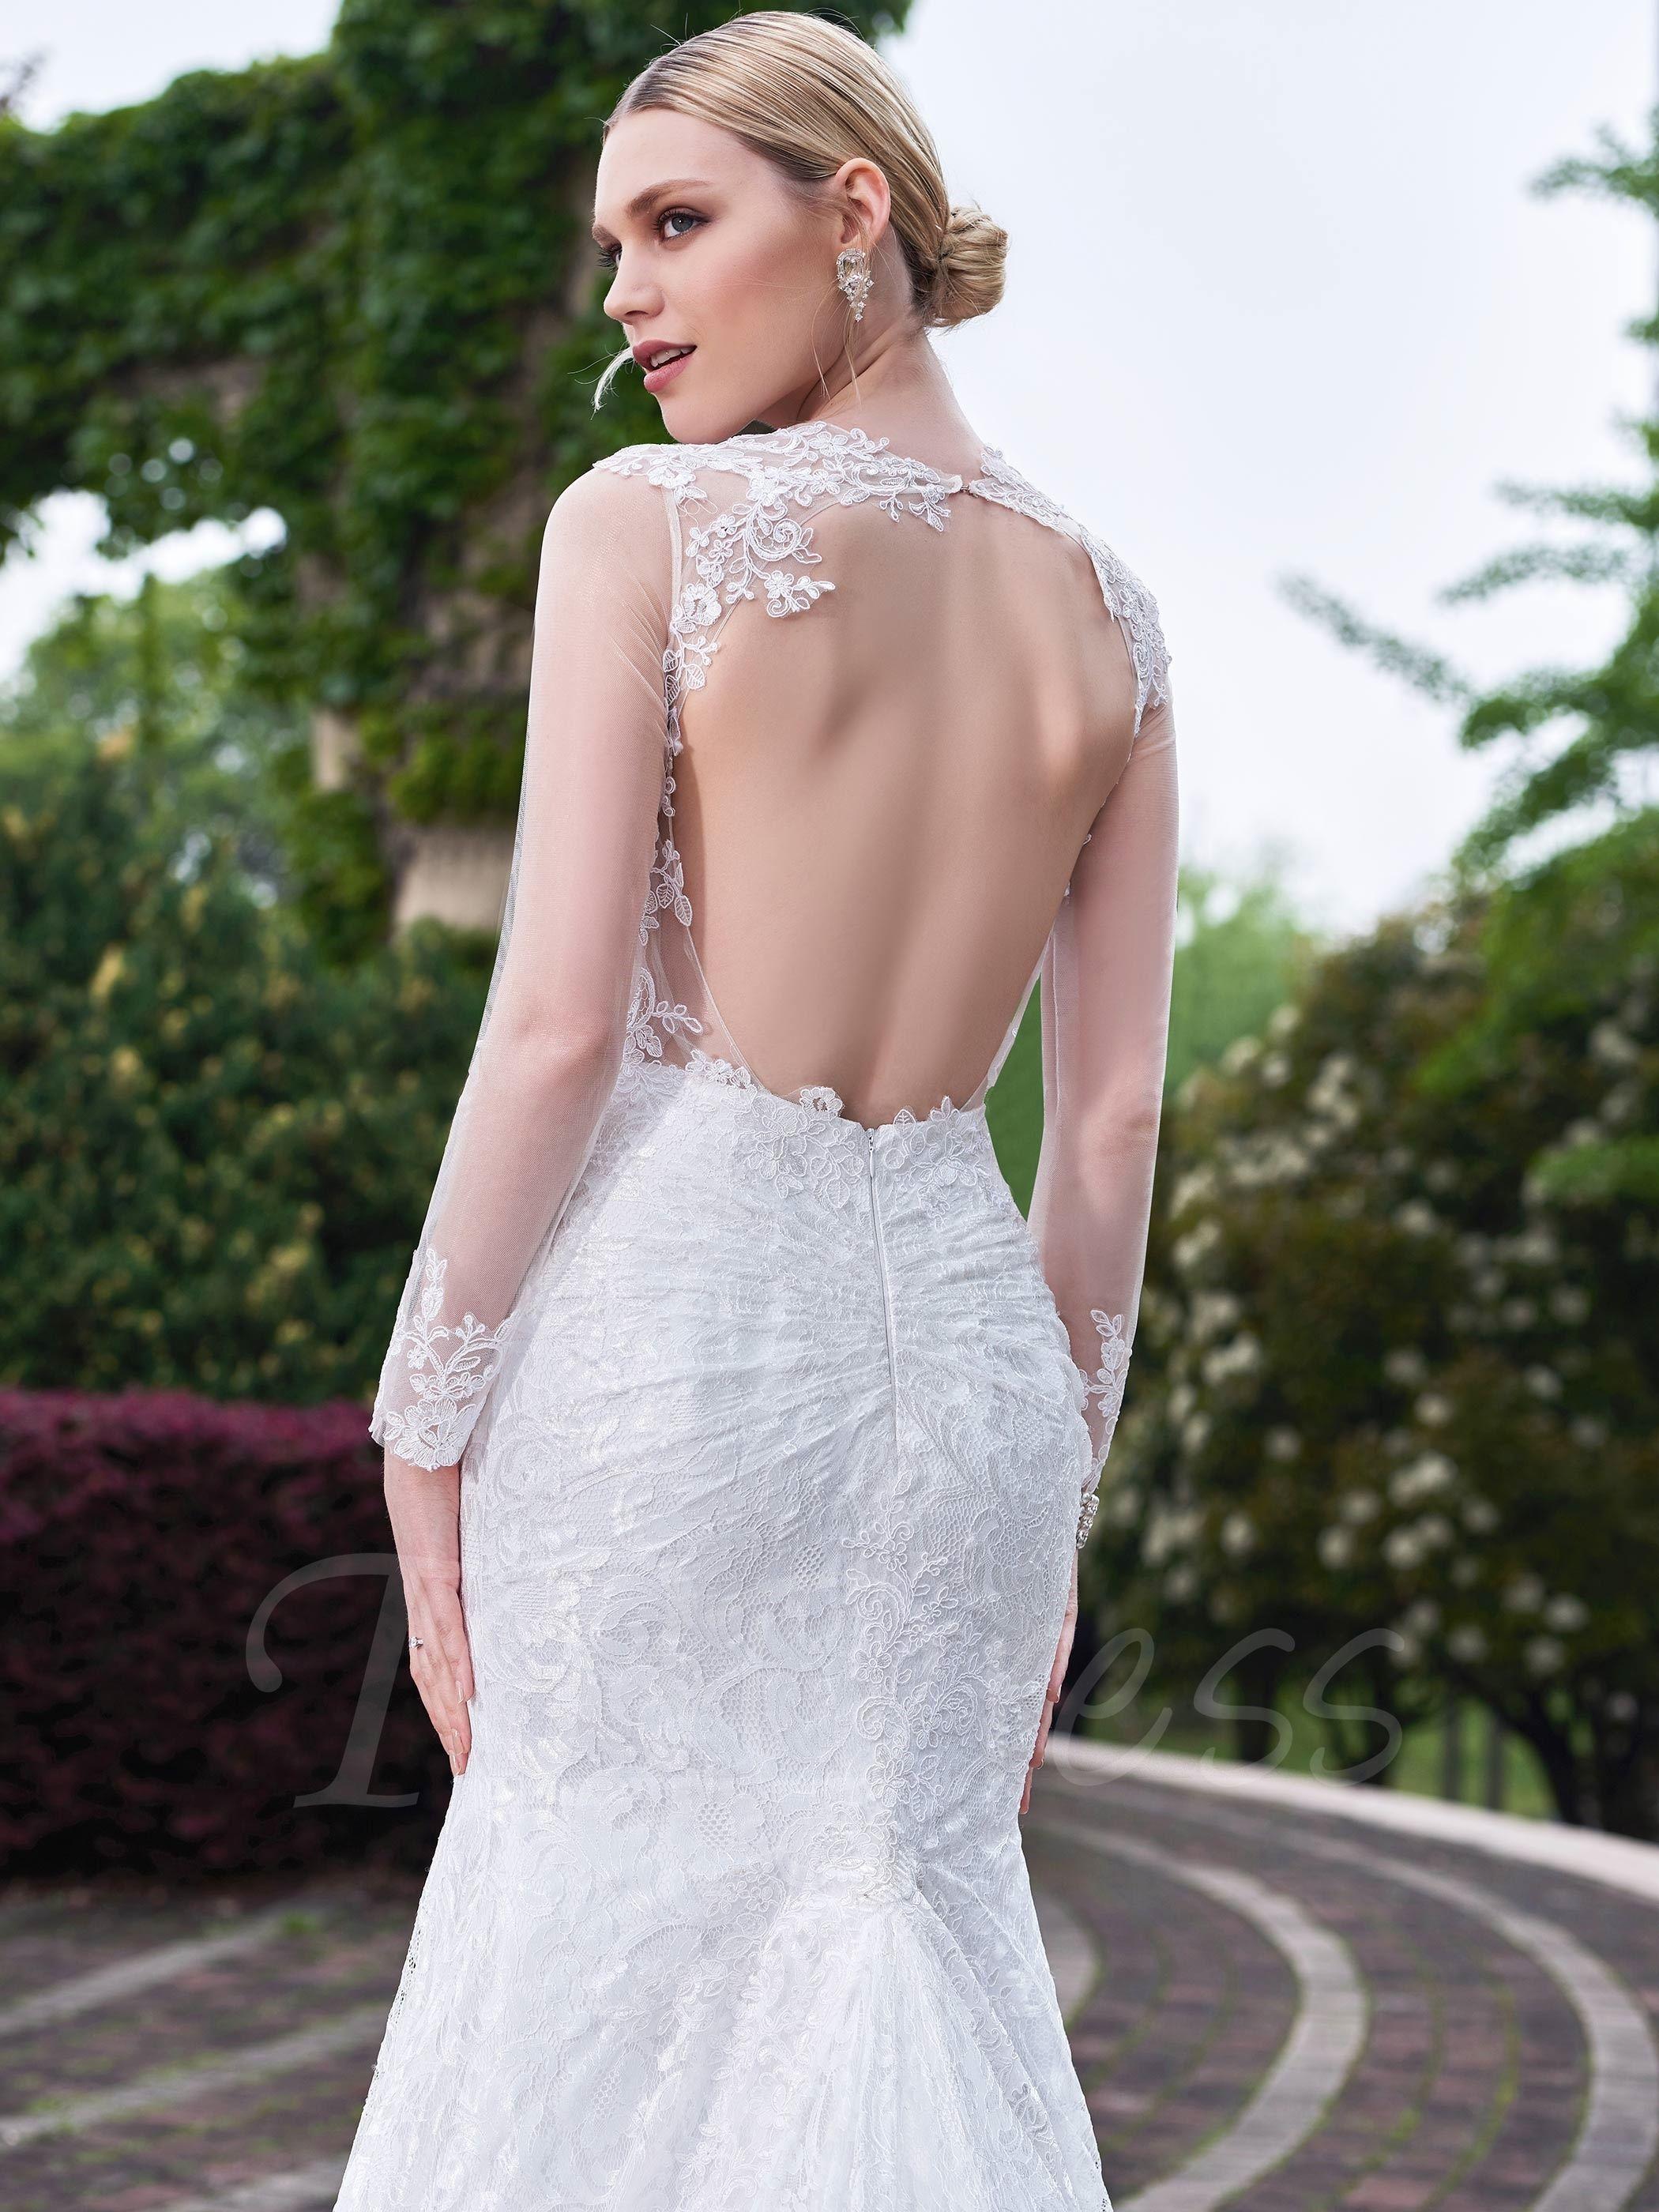 Long Sleeves Open Back Lace Sweetheart Mermaid Wedding Dress Wedding Dress Accessories Wedding Dresses Mermaid Sweetheart Lace Mermaid Wedding Dress